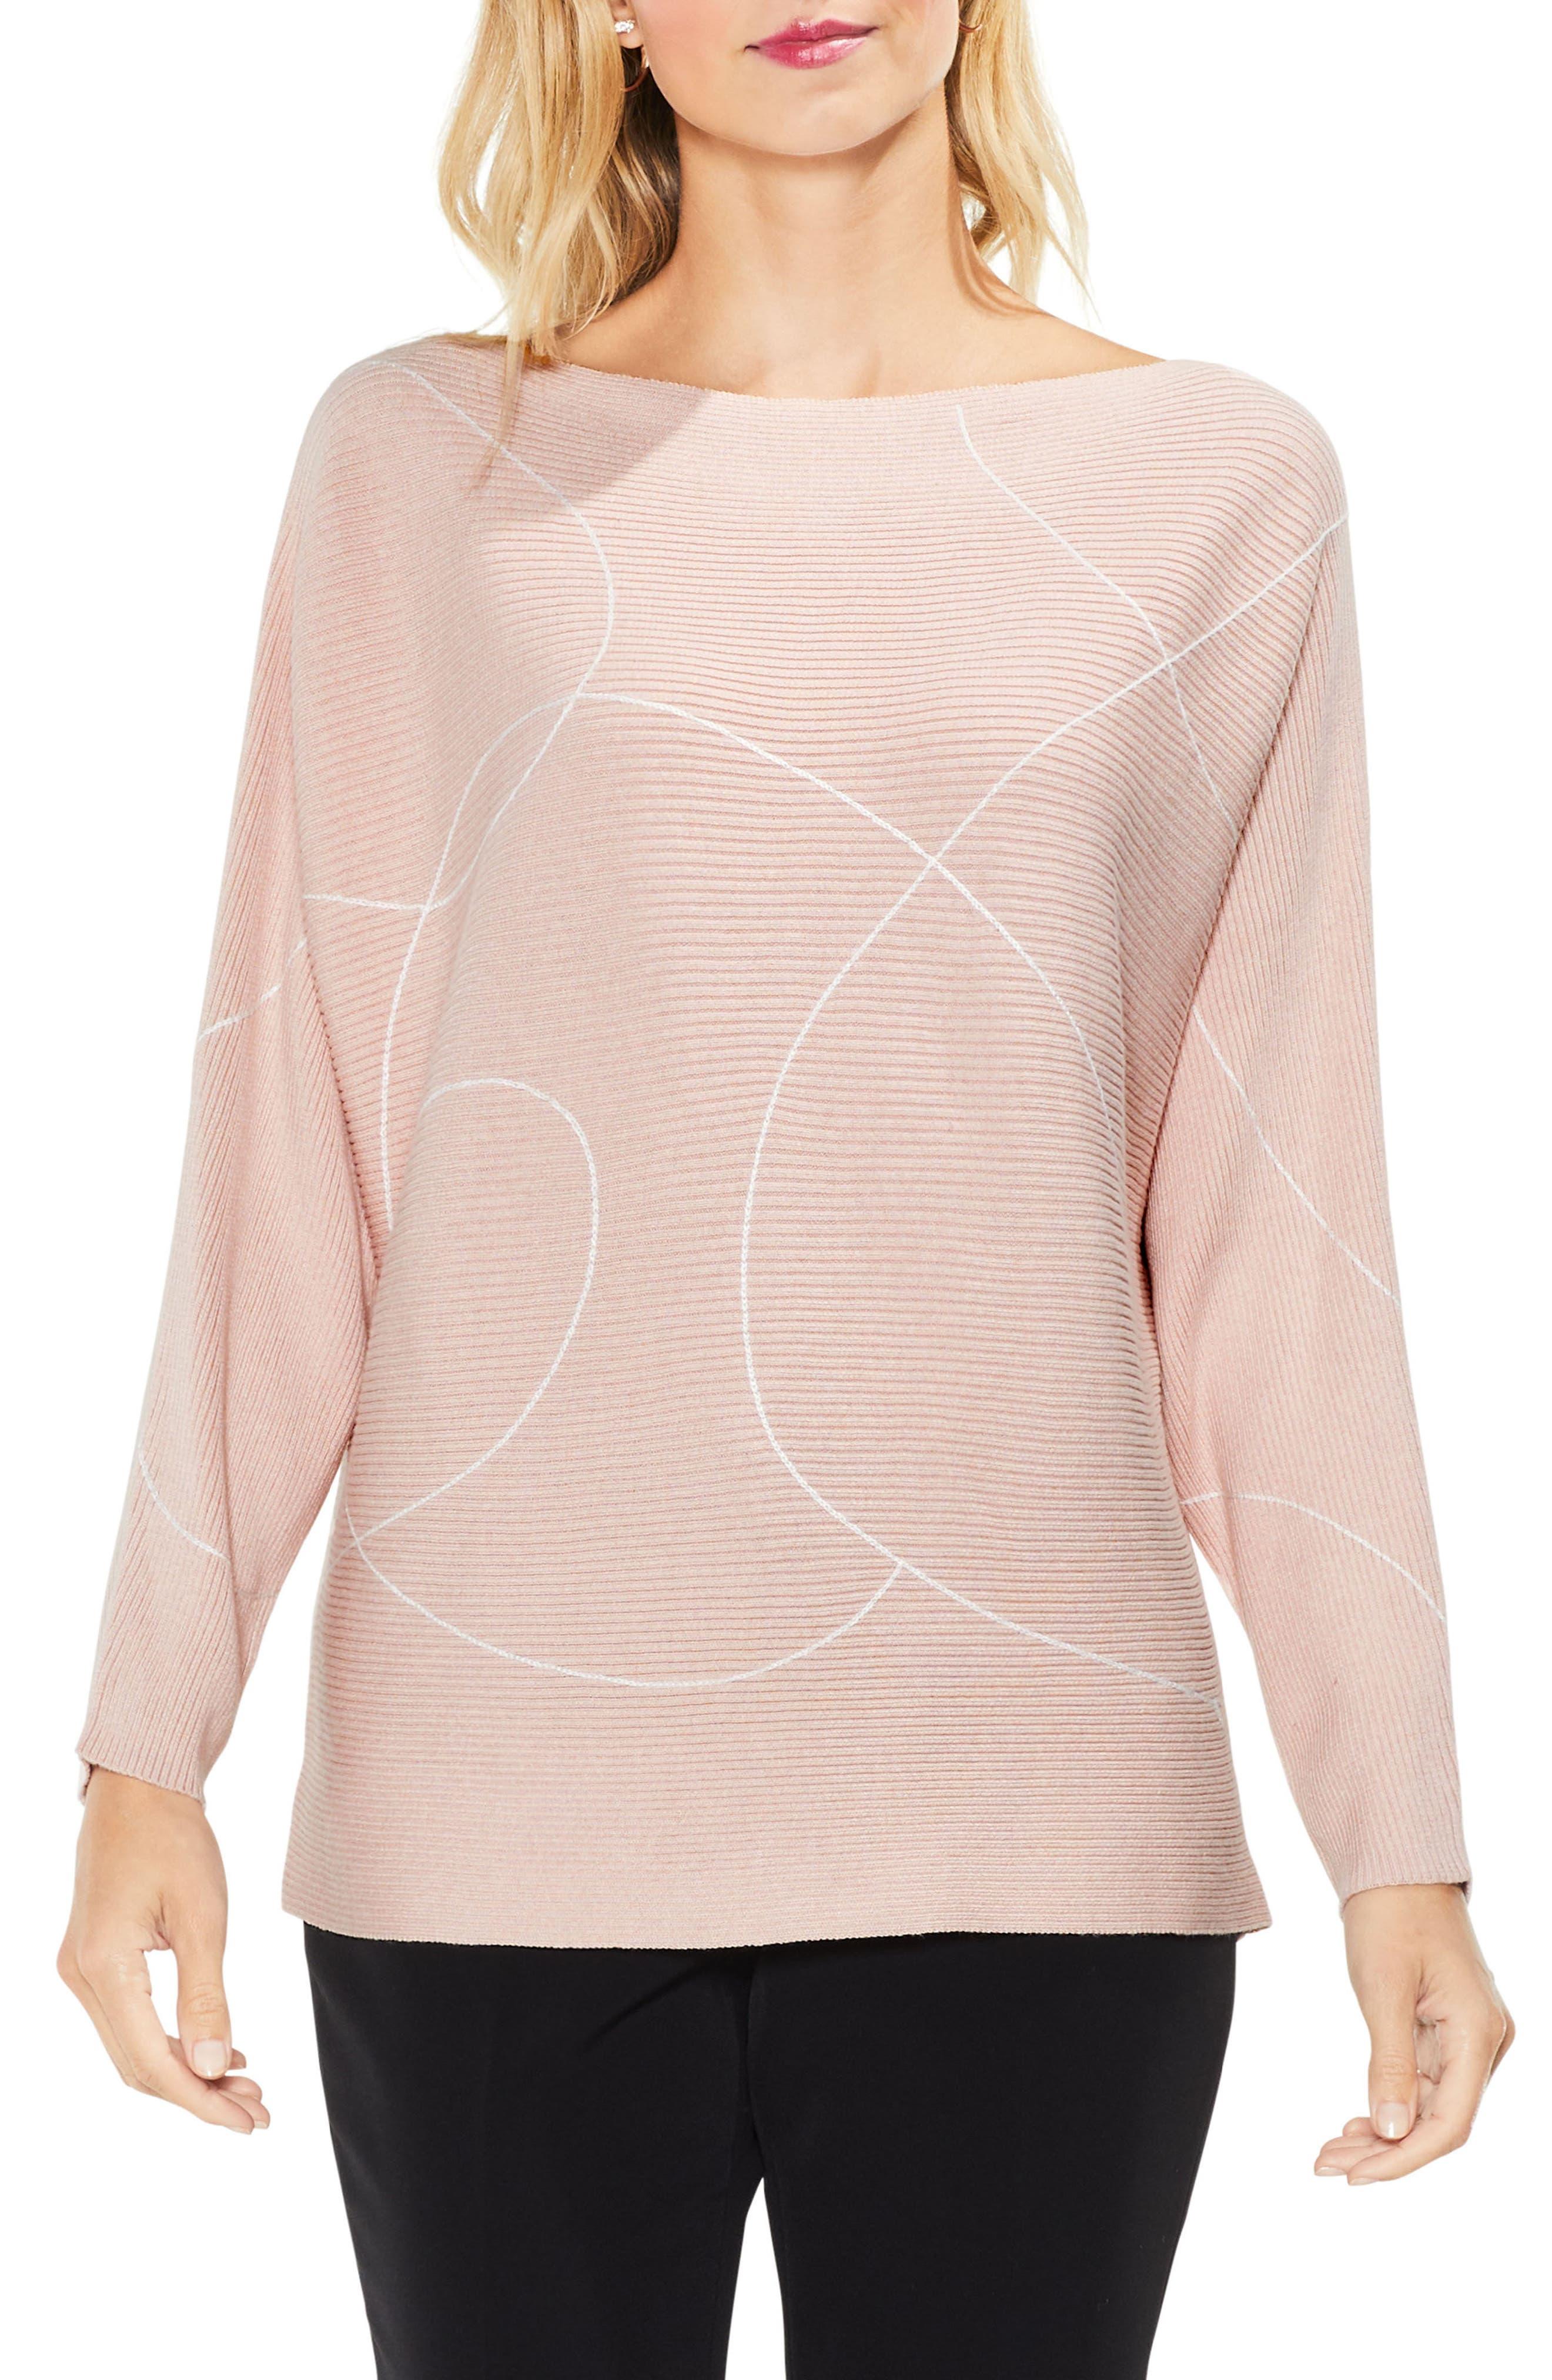 Ink Swirl Ribbed Sweater,                             Main thumbnail 1, color,                             Rose Buff